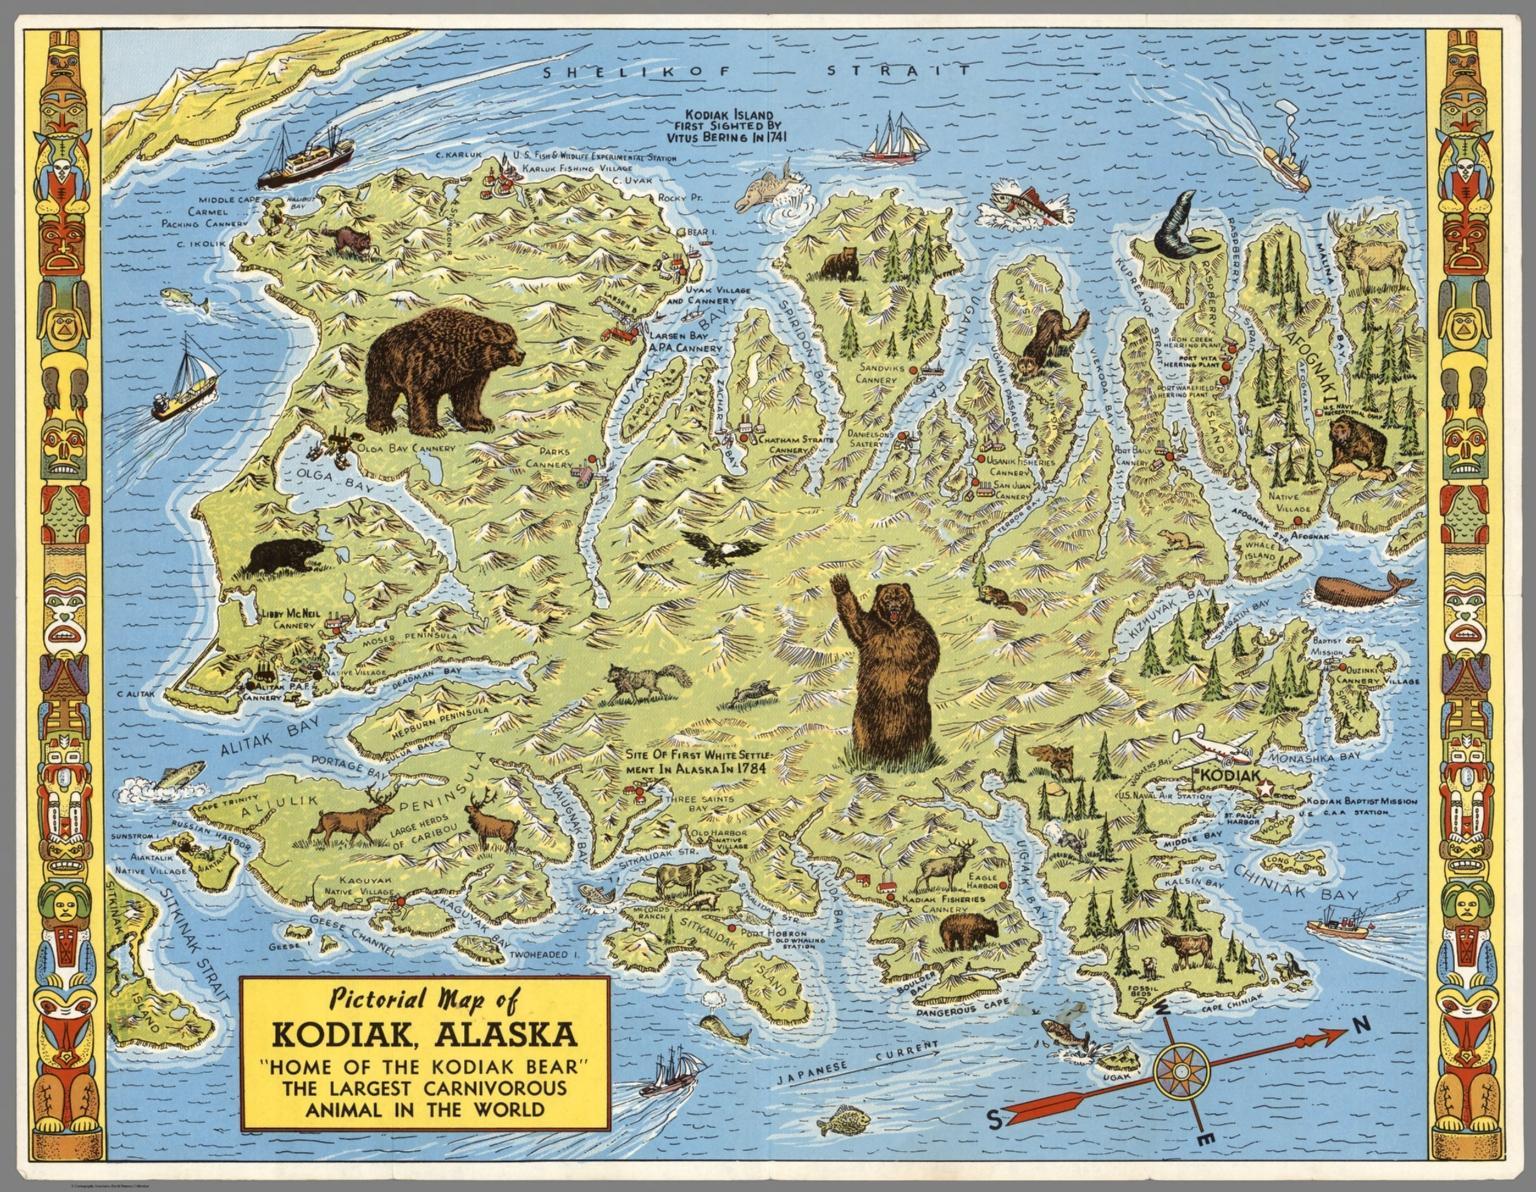 "Pictorial Map of Kodiak, Alaska. ""Home of the Kodiak Bear"", The Largest Carnivorous Animal in the World."